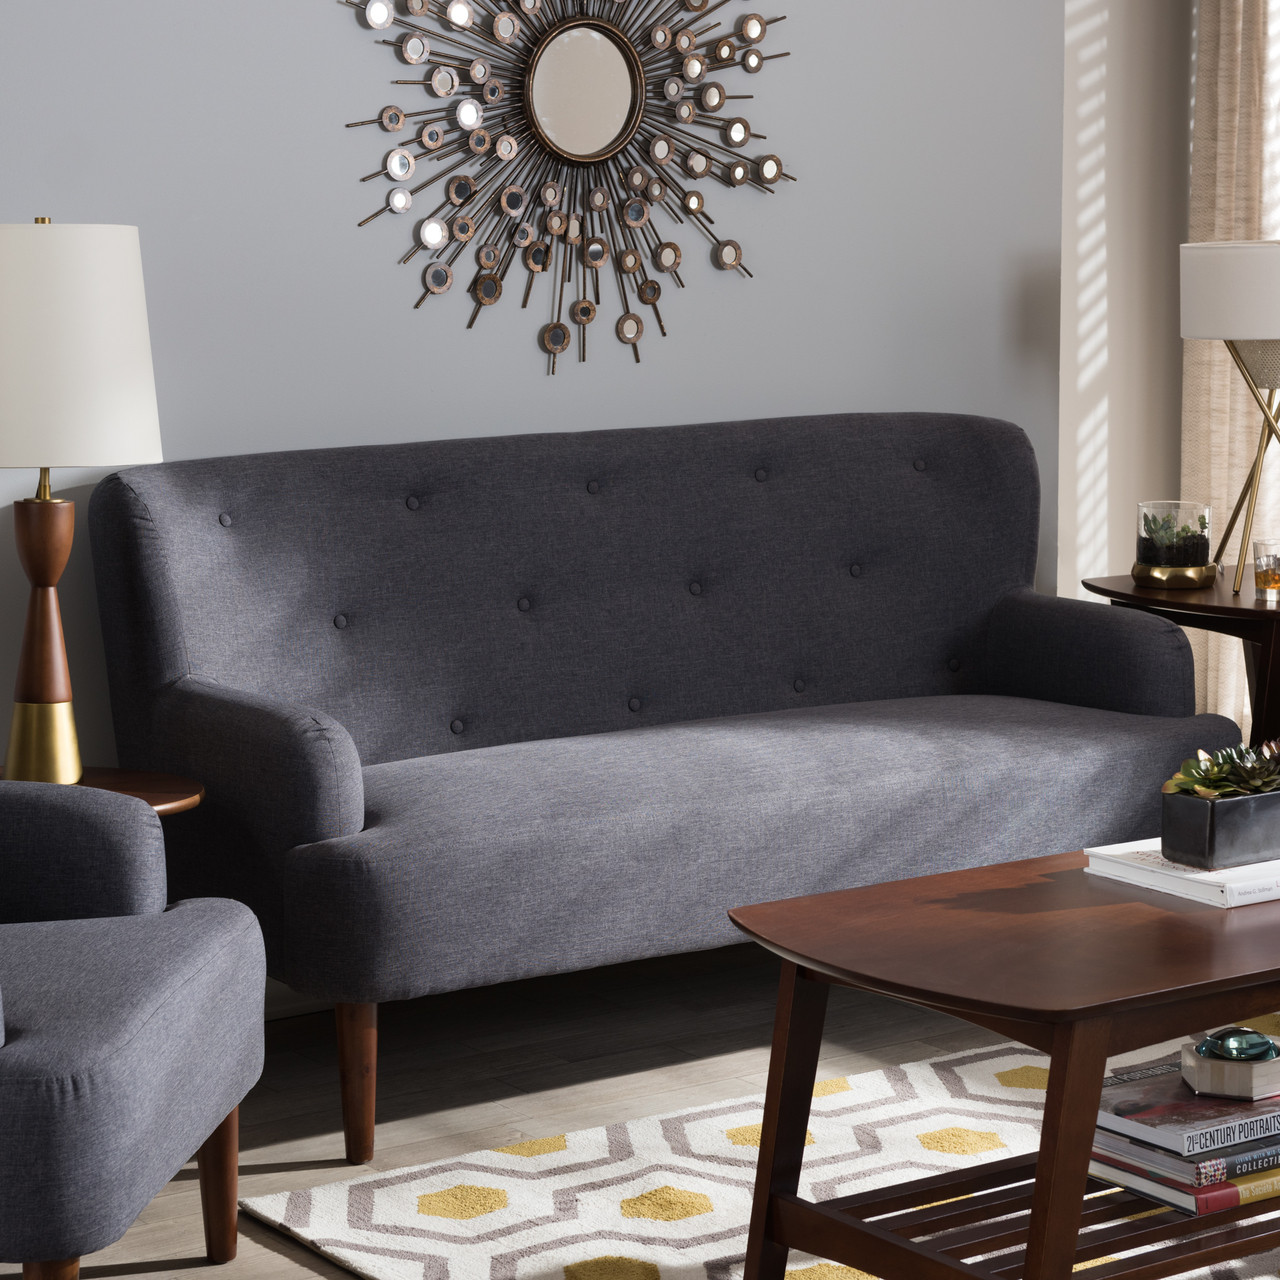 Baxton studio toni mid century modern dark grey fabric upholstered walnut wood button tufted